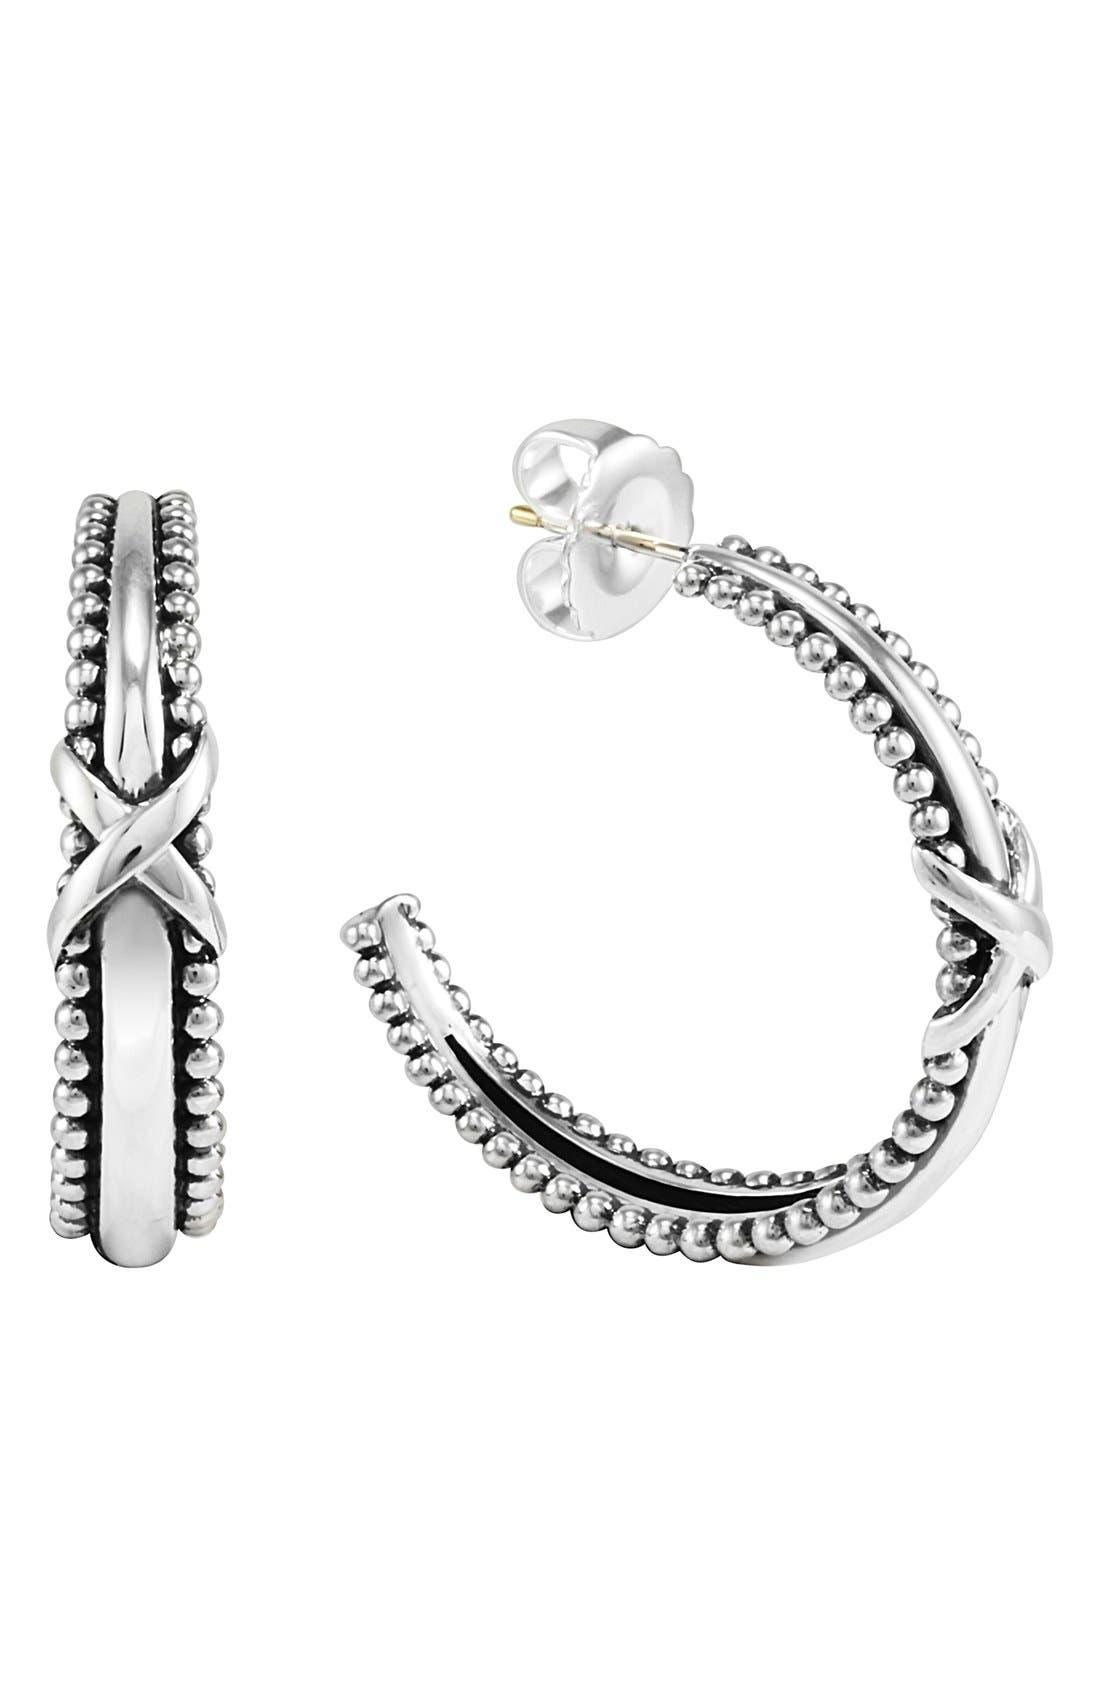 Alternate Image 1 Selected - LAGOS 'X' Caviar Tapered Hoop Earrings